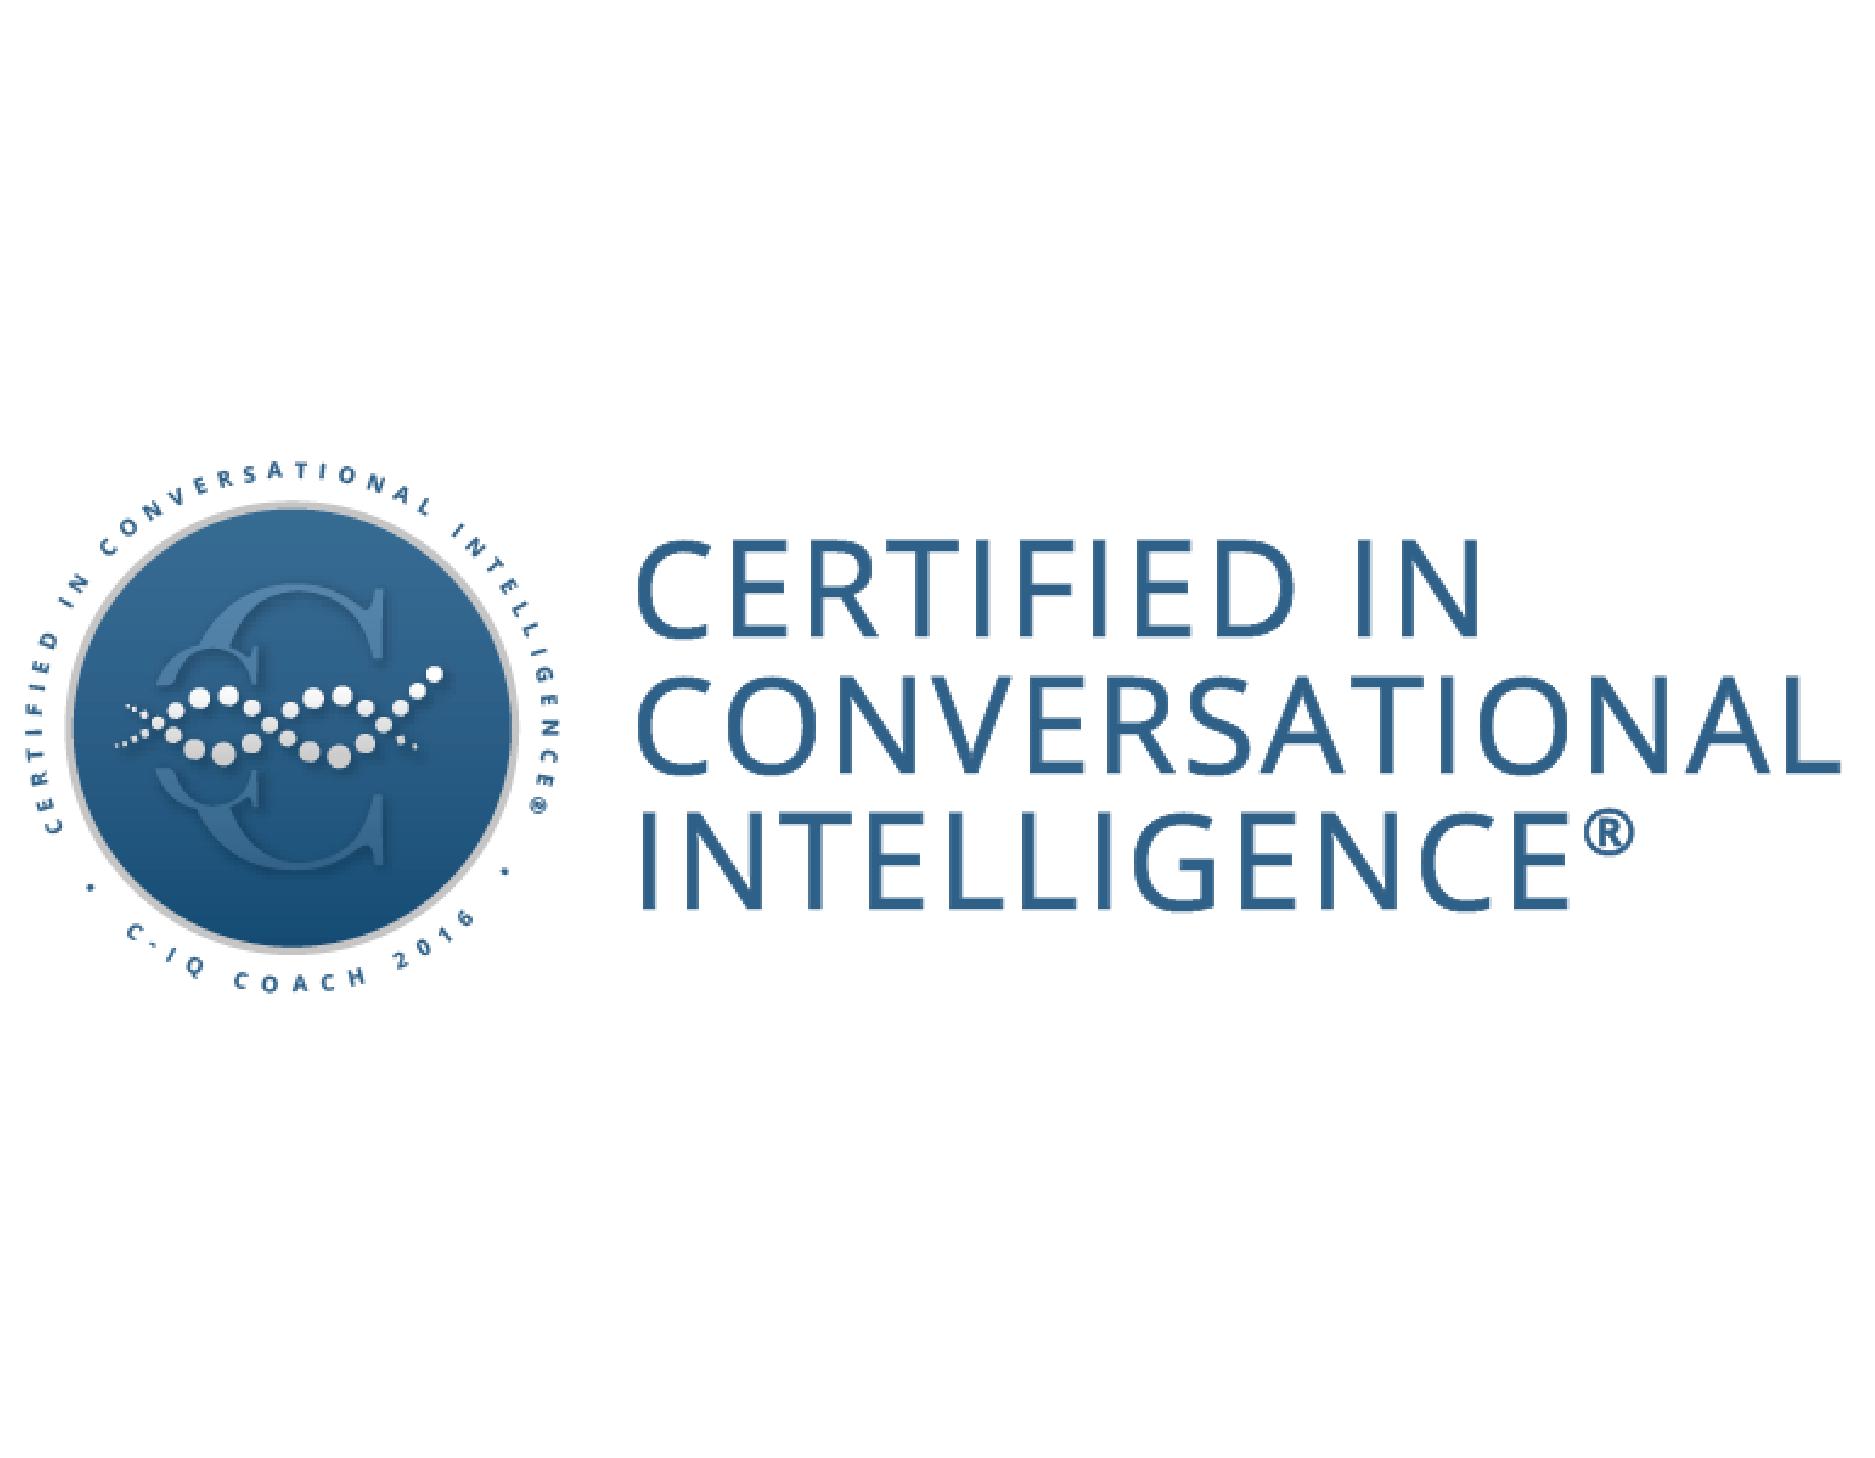 Coaching Credentail Logos 2_Conversational Intelligence.png